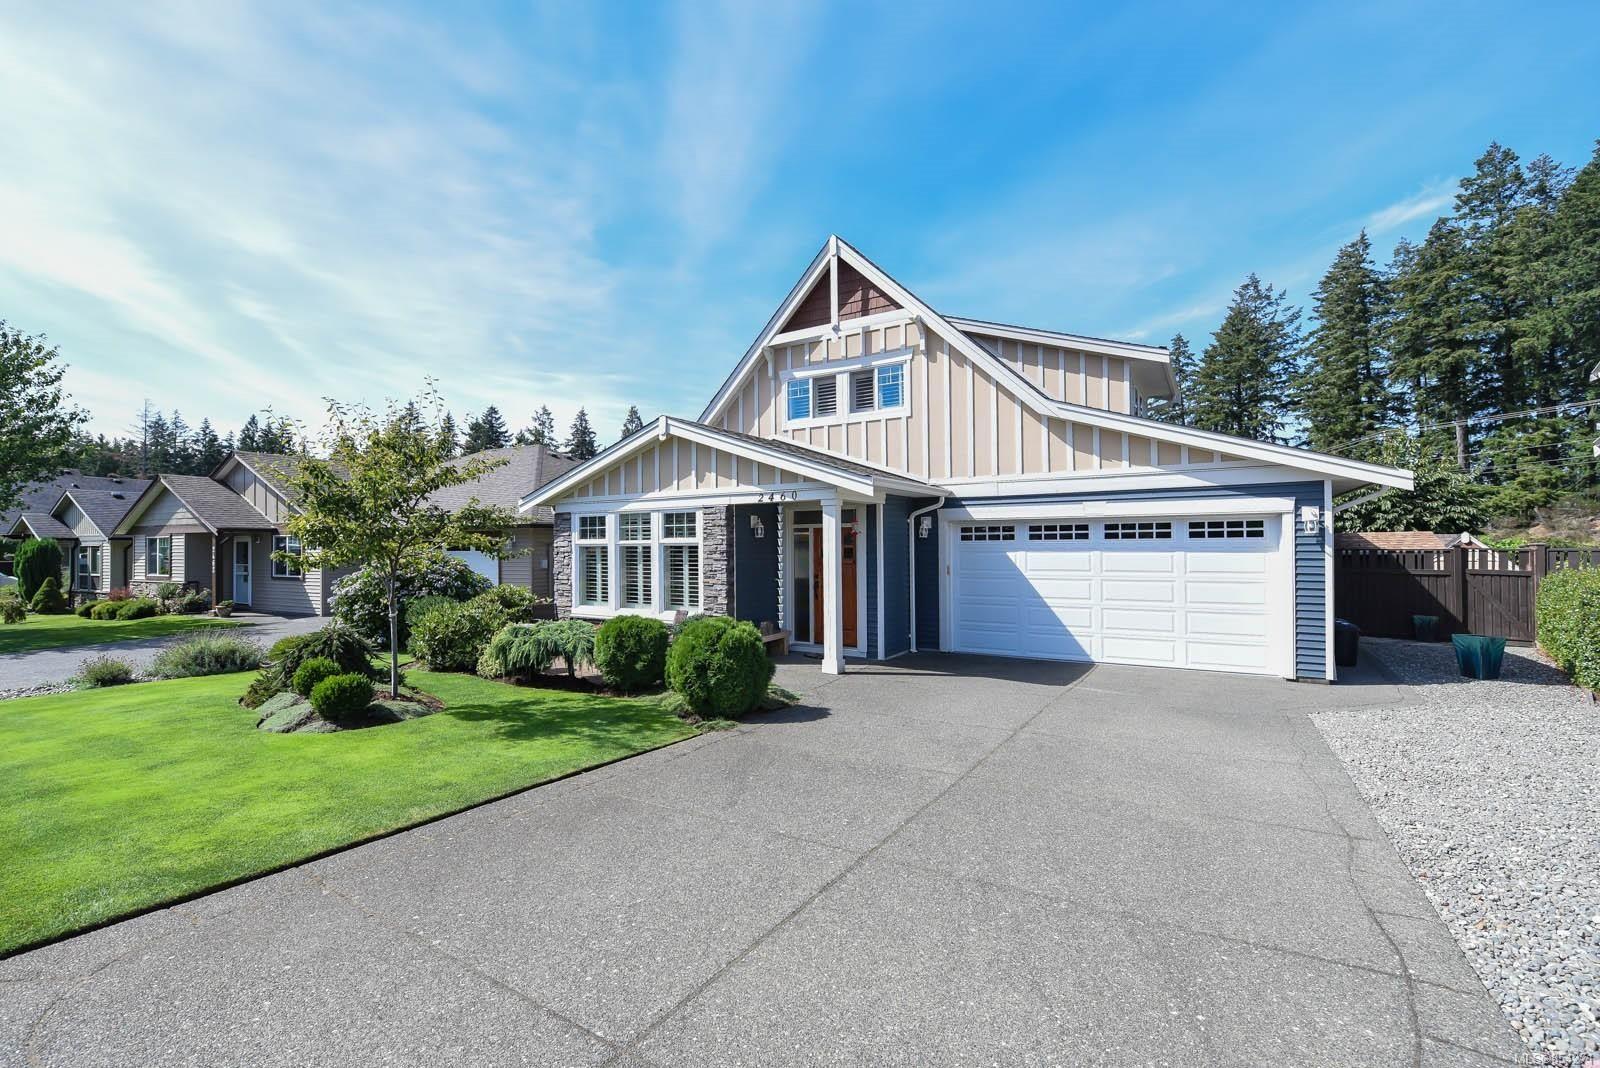 Main Photo: 2460 Avro Arrow Dr in : CV Comox (Town of) House for sale (Comox Valley)  : MLS®# 854271